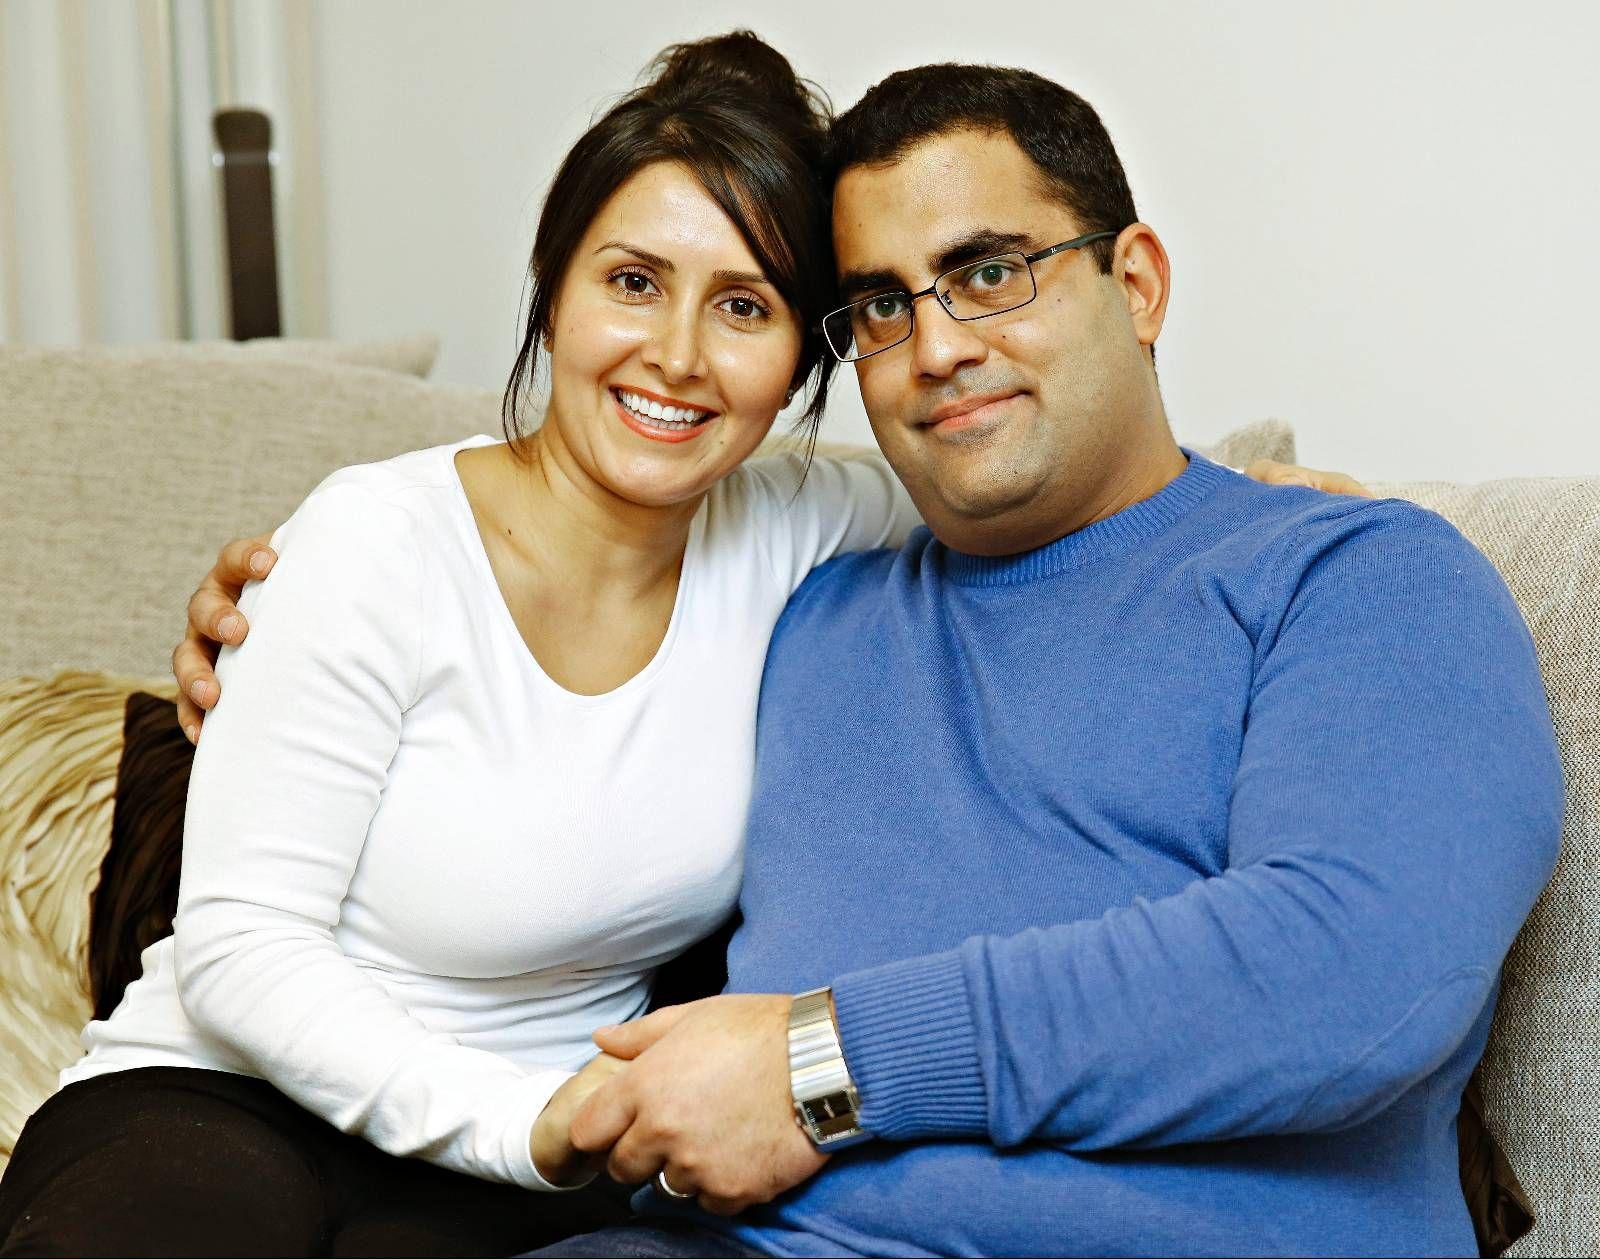 online dating erfolgscode eBok